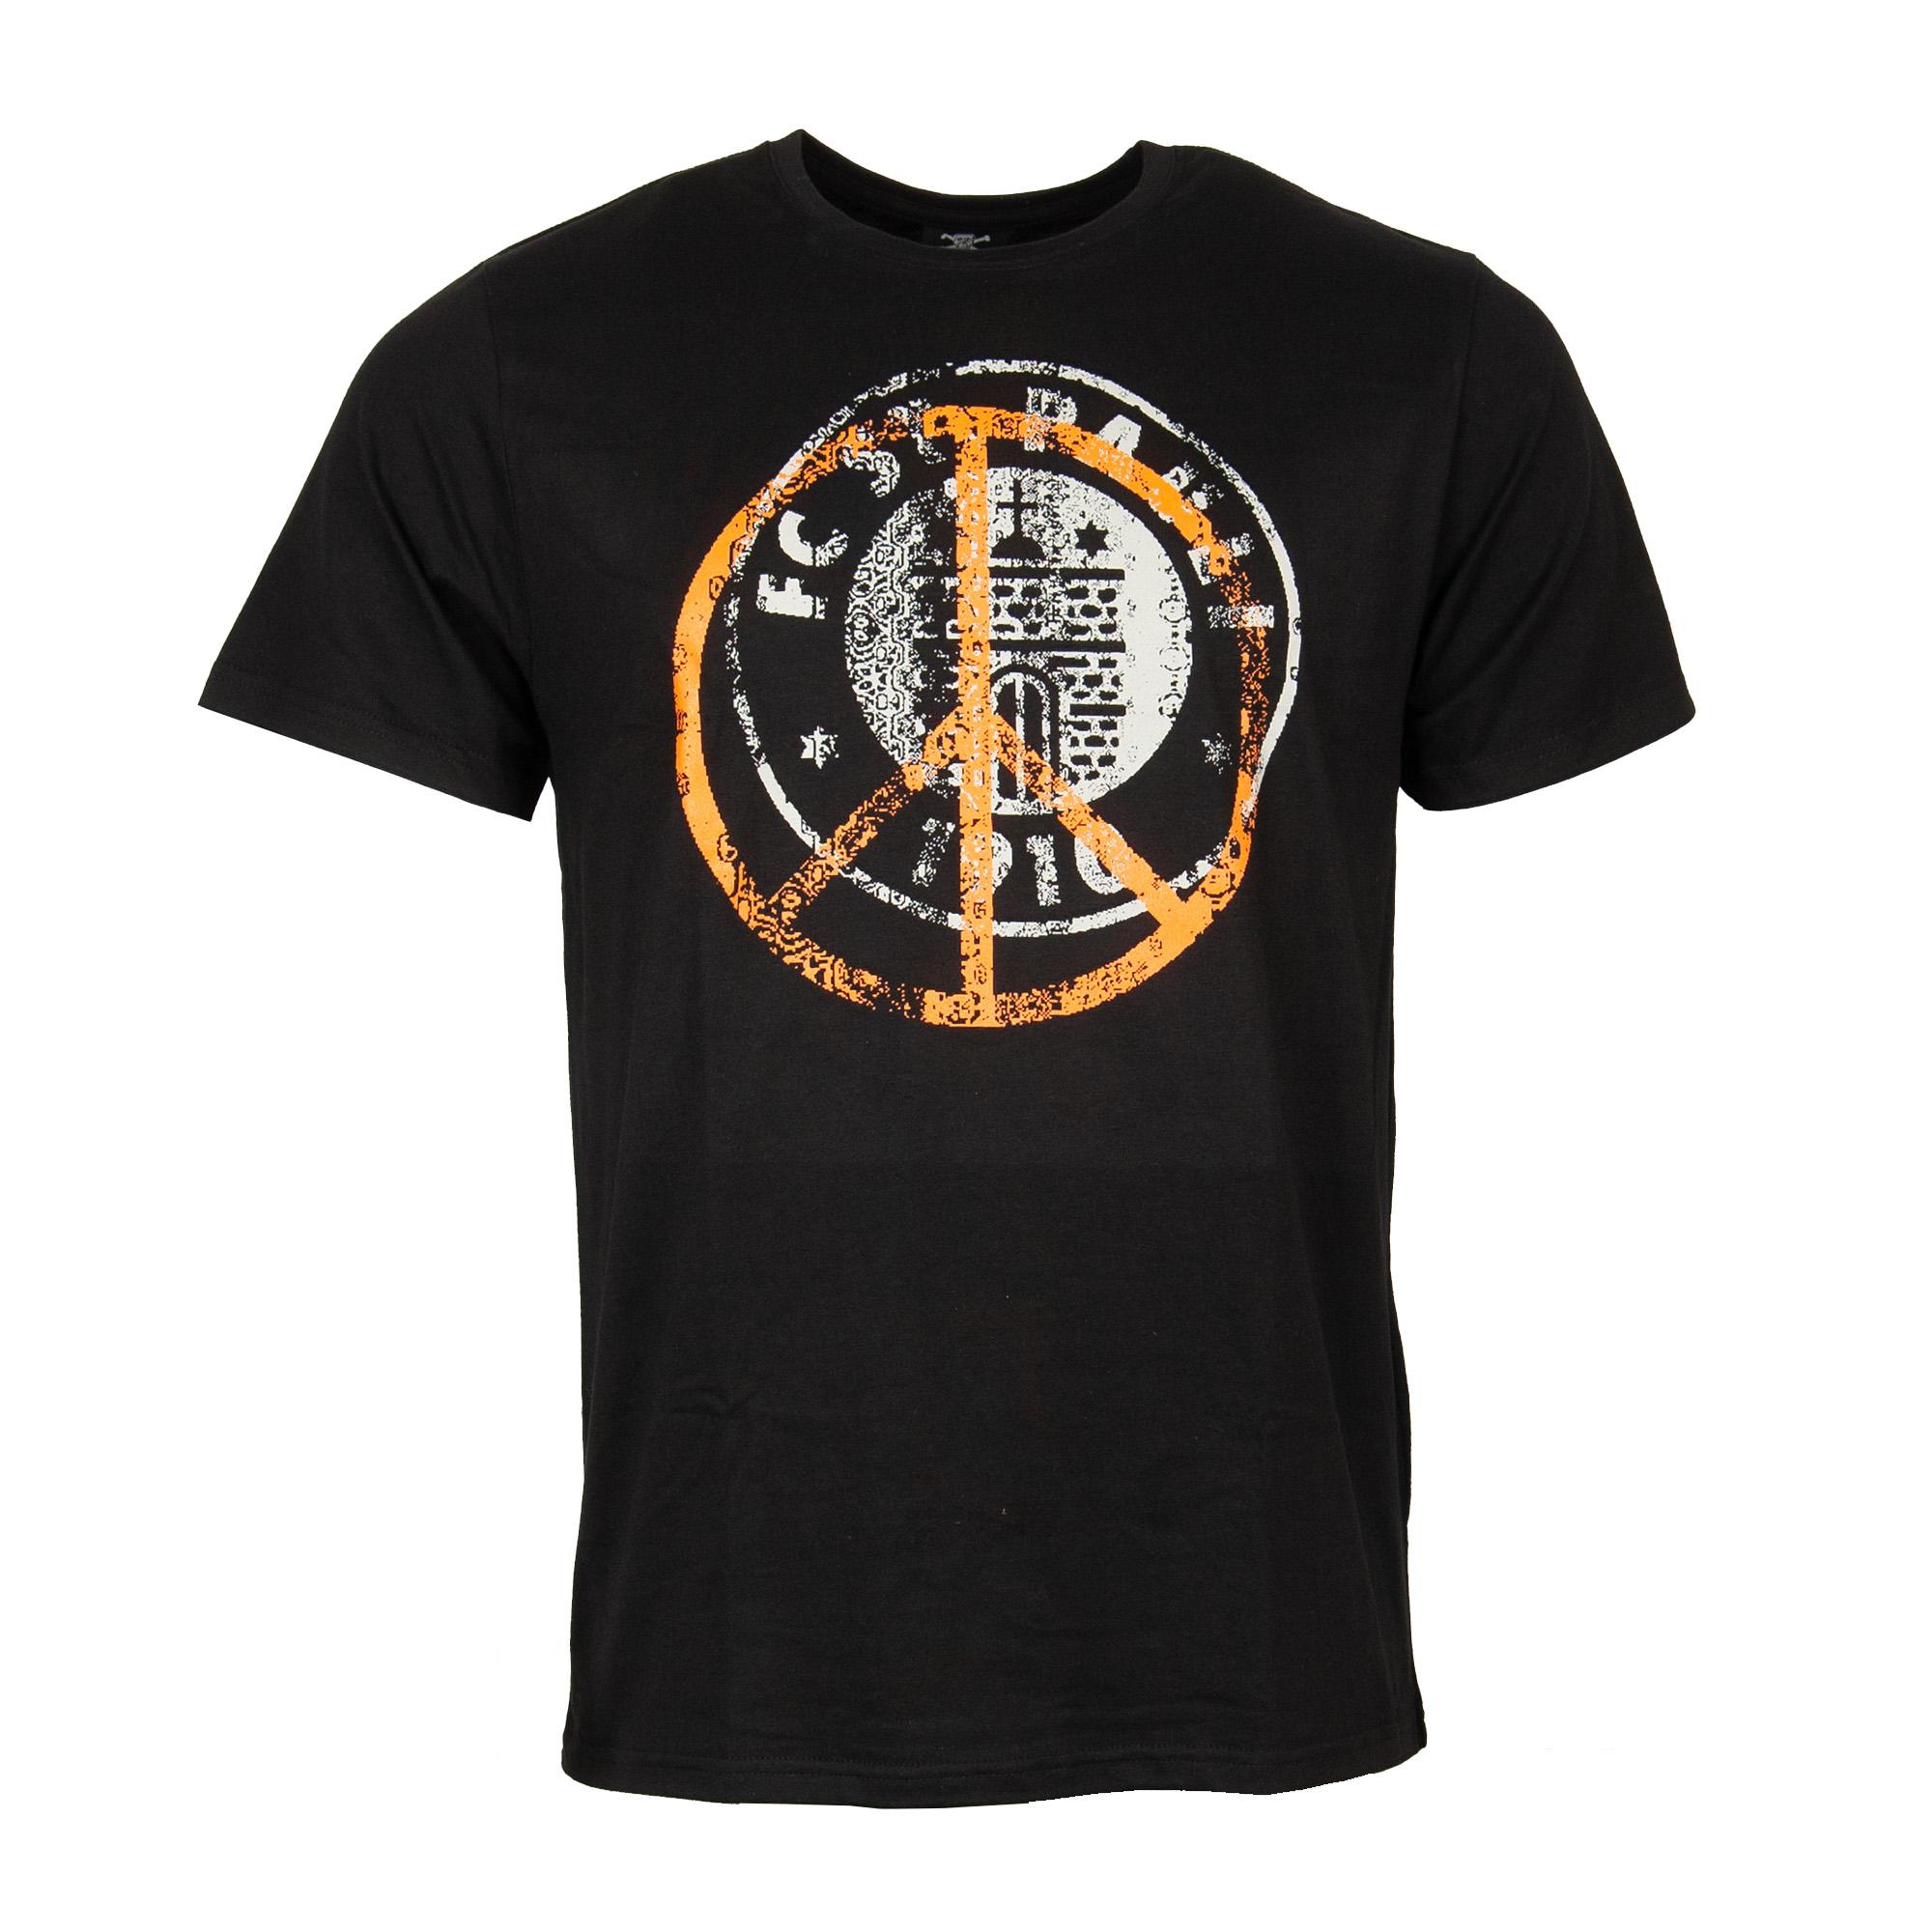 FC St. Pauli - T-Shirt Peace Oliv-Orange - schwarz